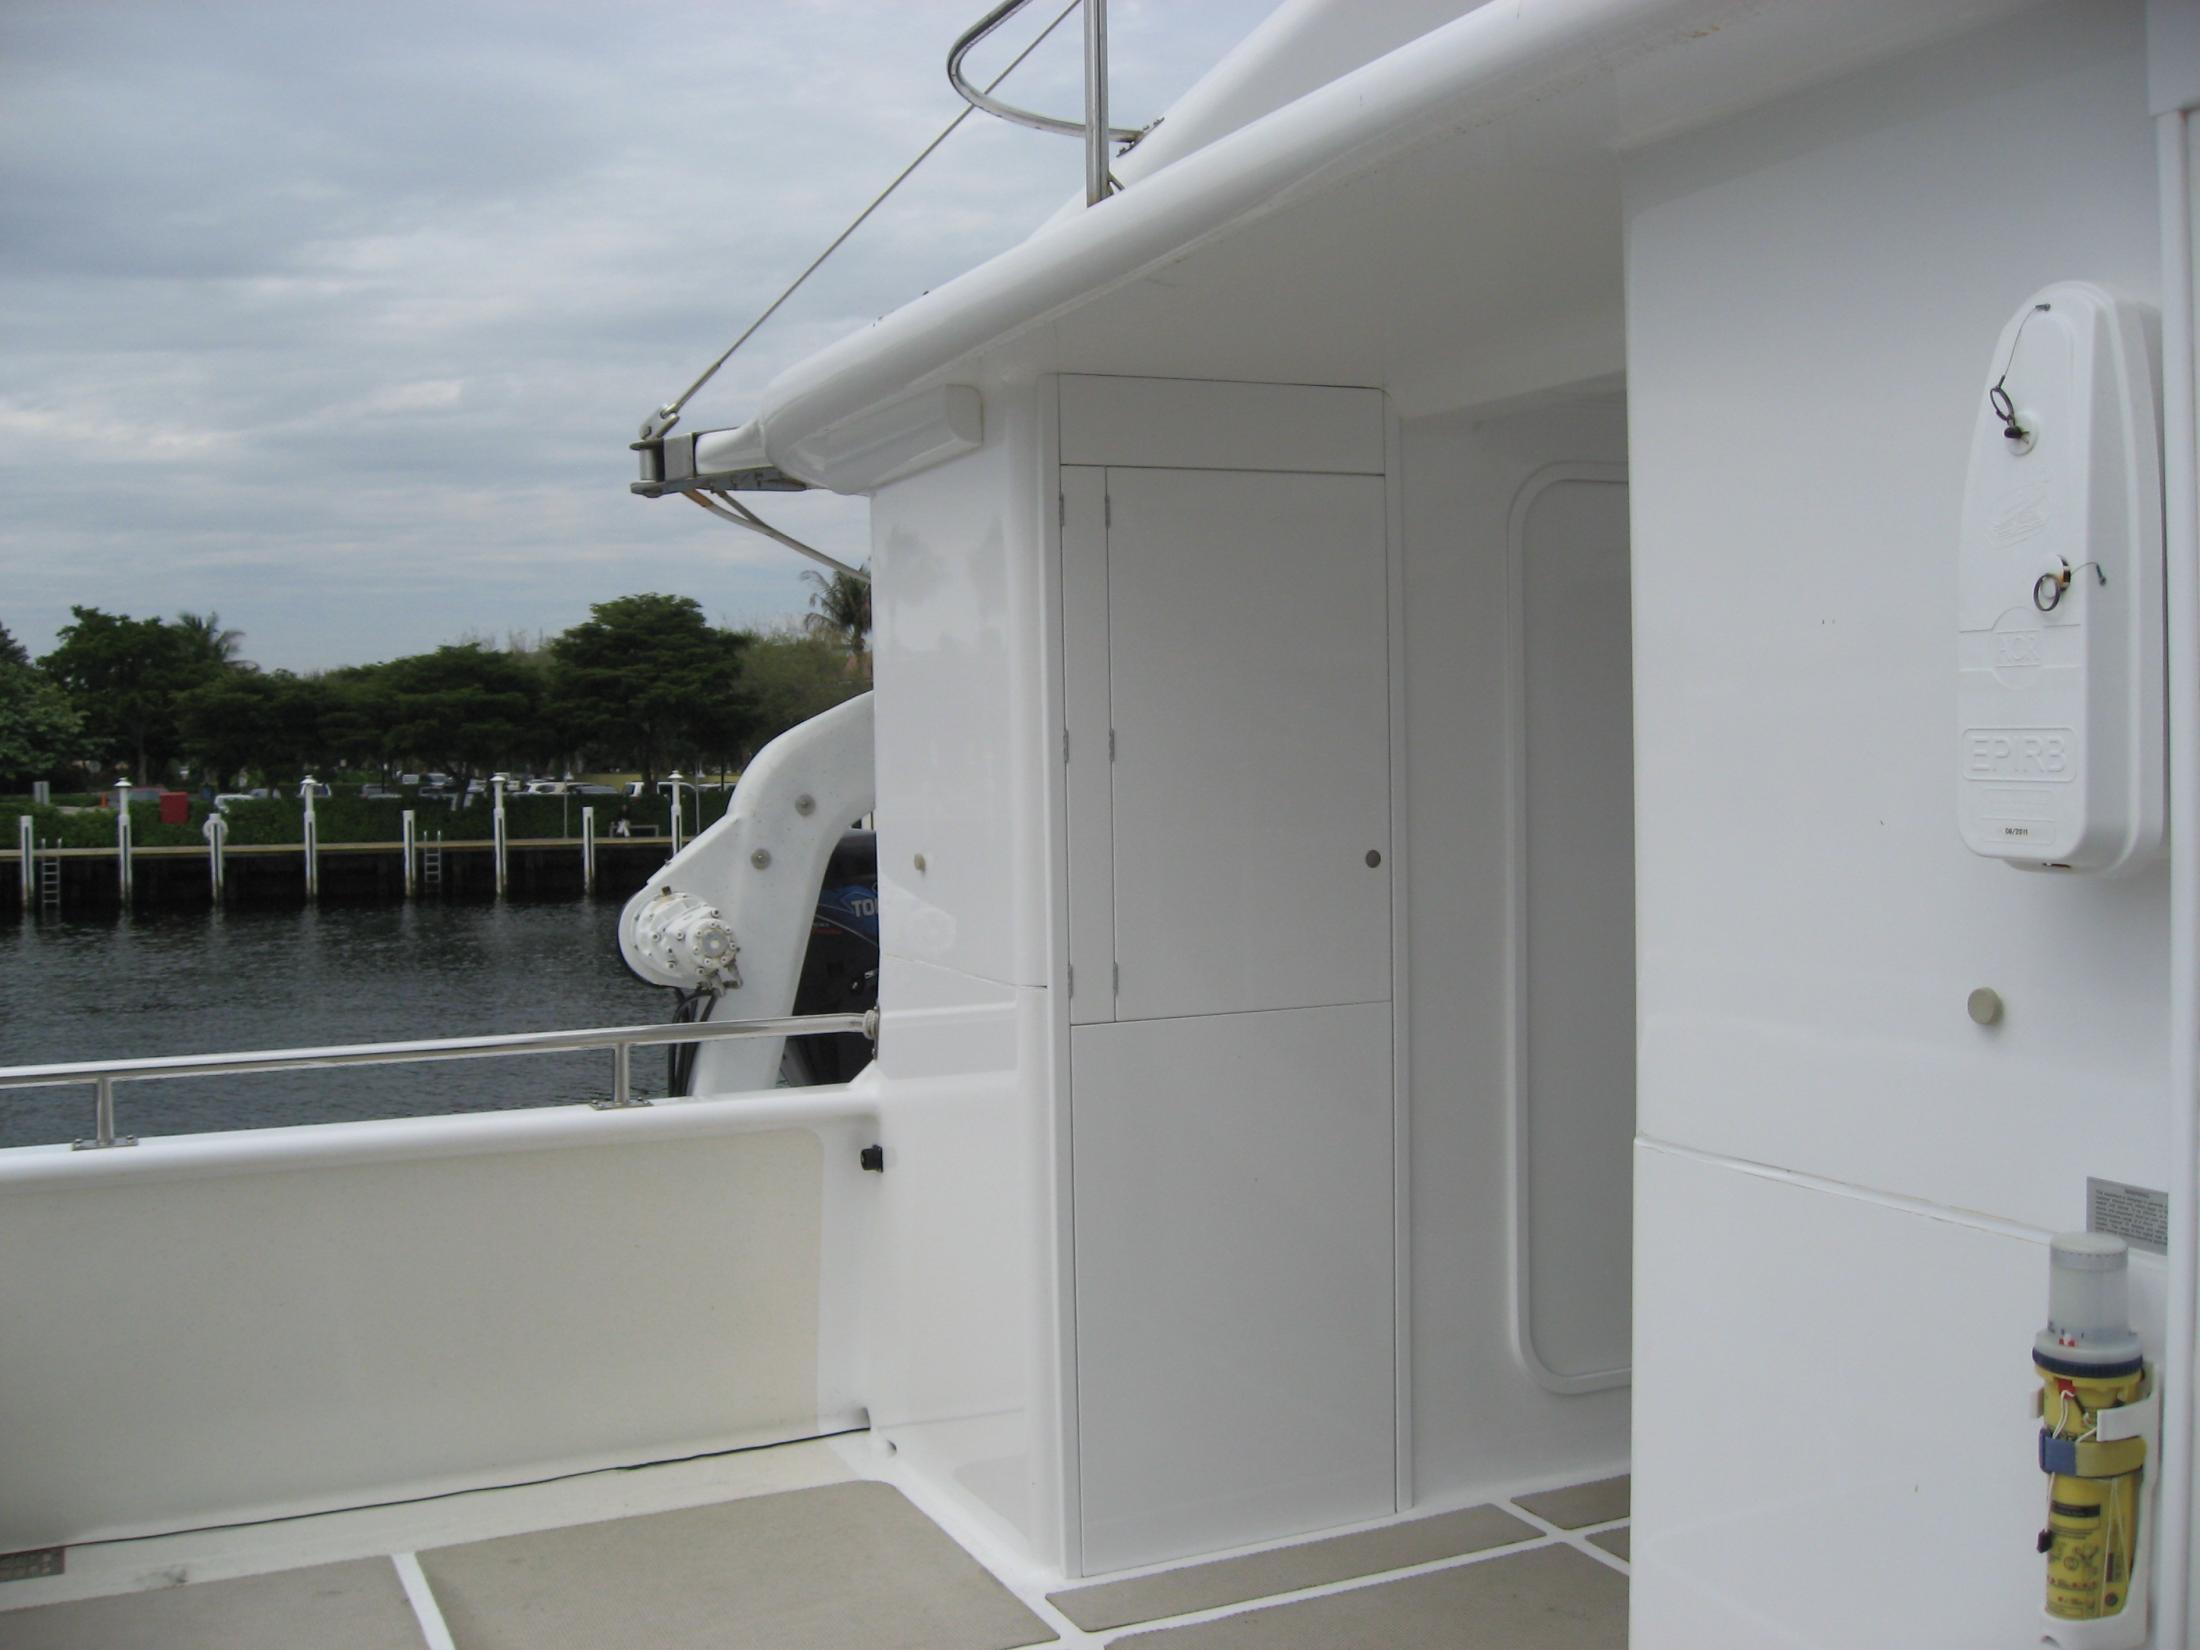 Middle Cockpit